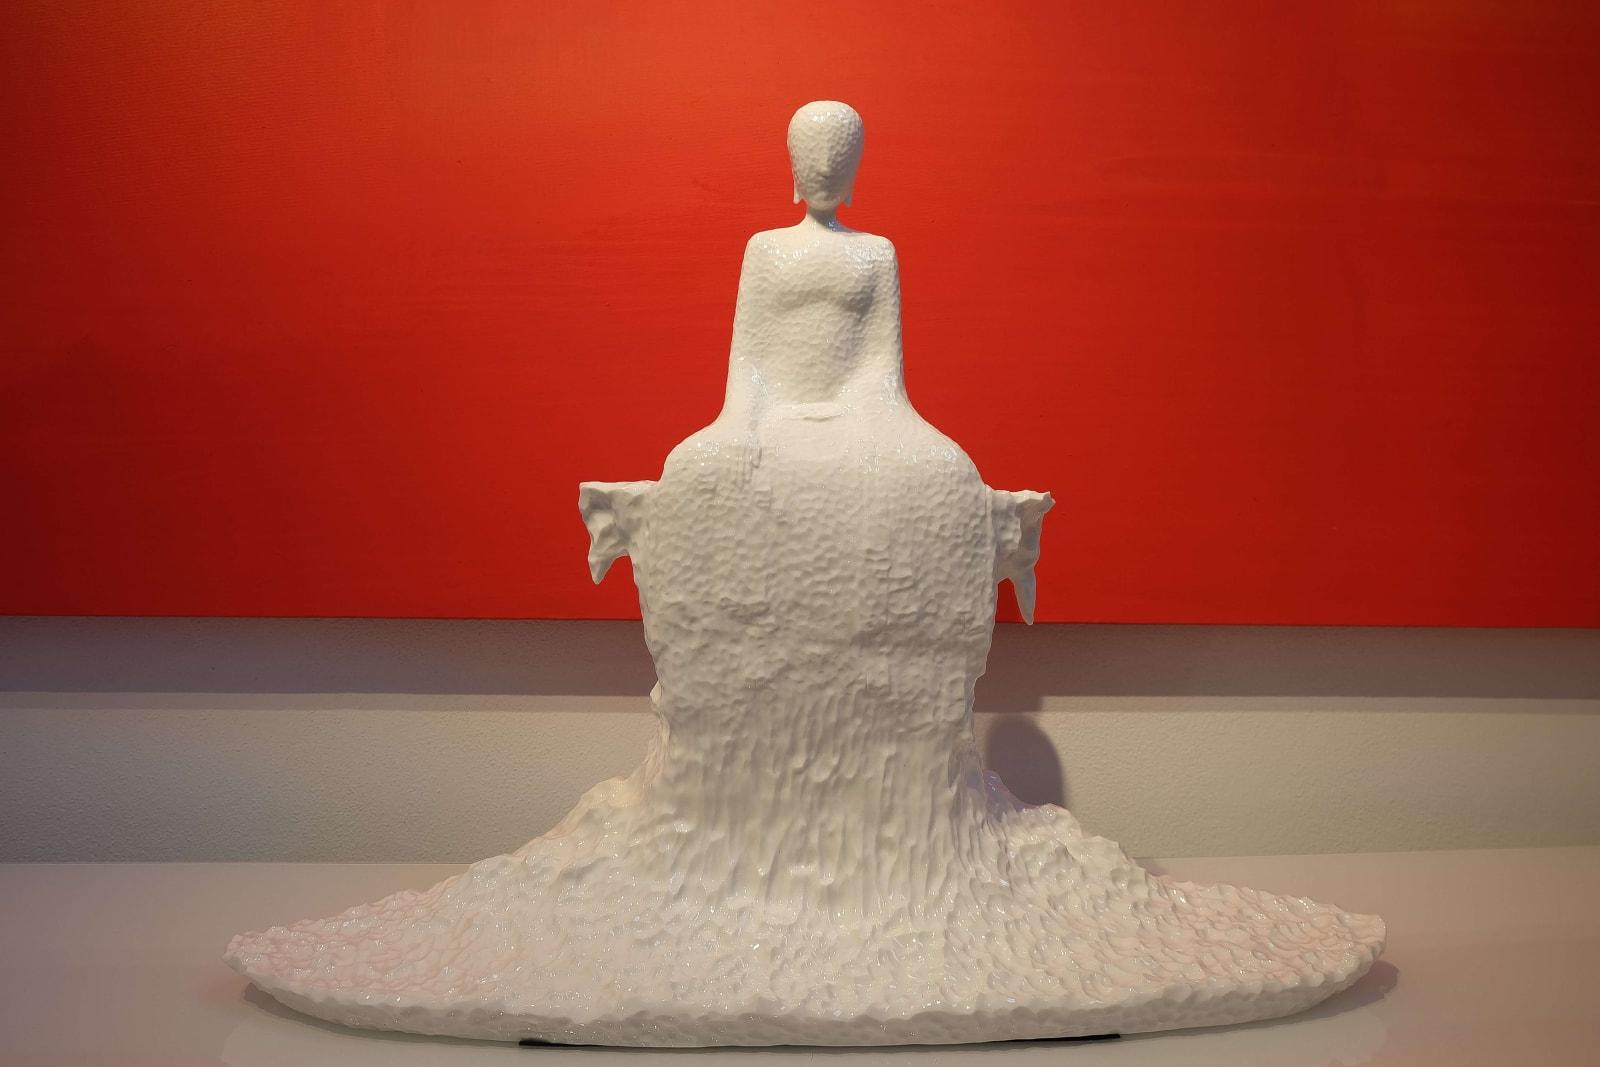 BLANC DE CHINE: Contemporary Visions